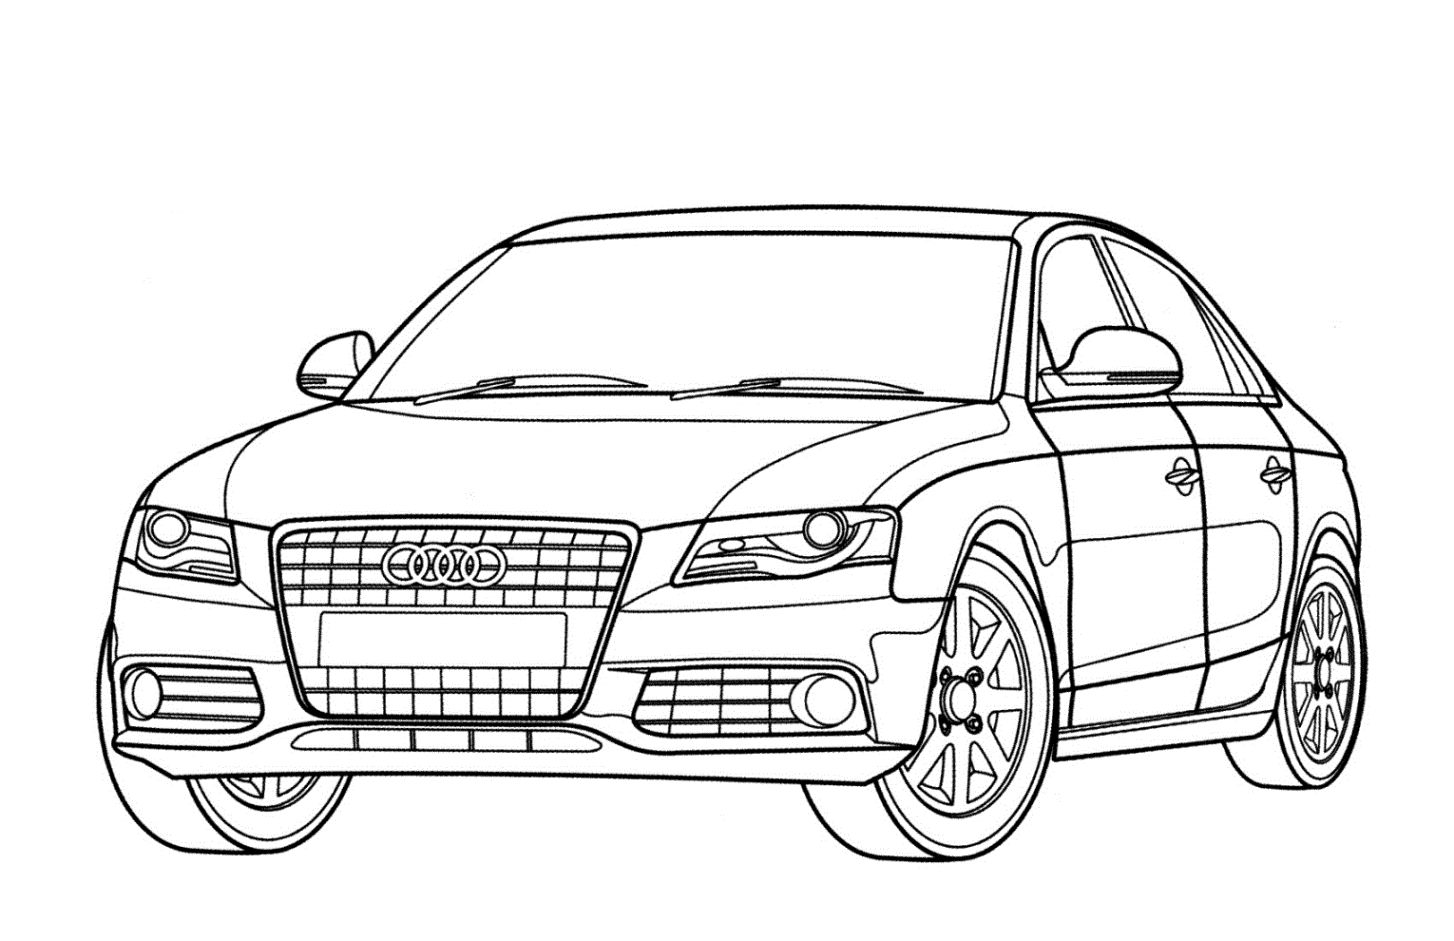 Malvorlagen Audi  Malvorlage auto, Audi 23, Malvorlagen